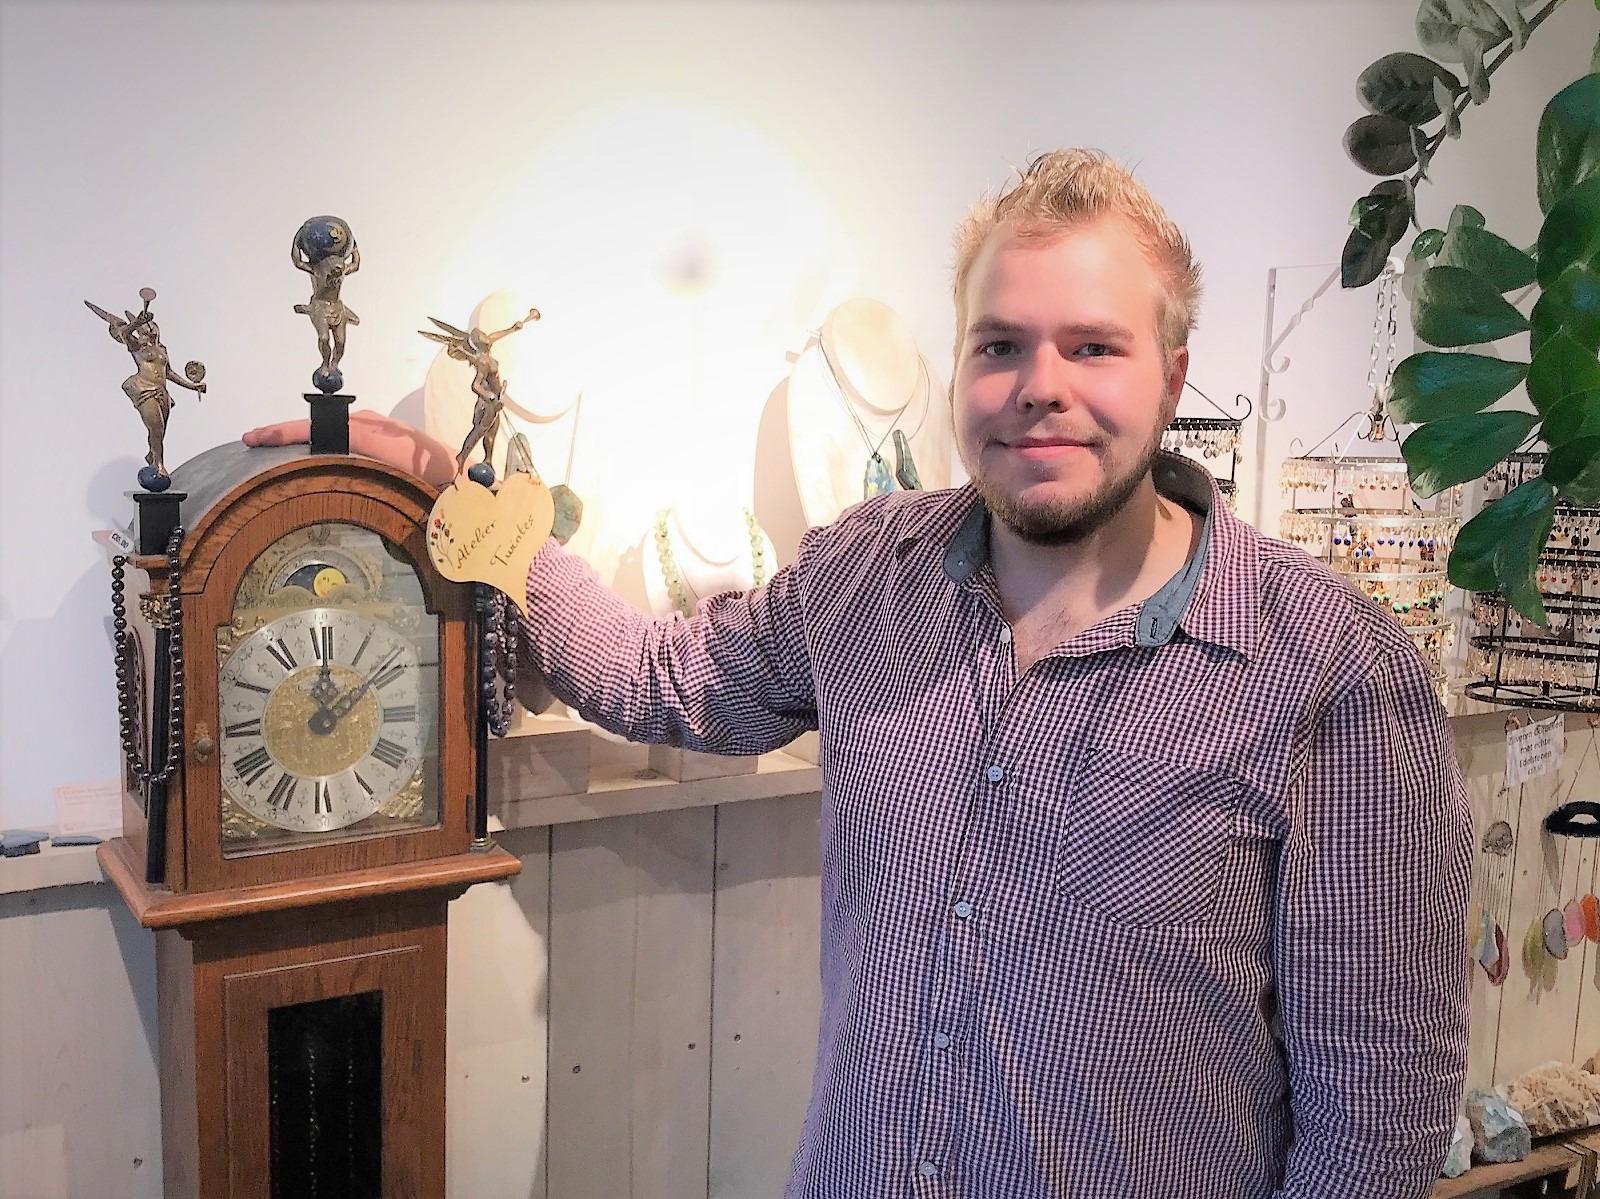 Klokkenmaker Yordi Bok